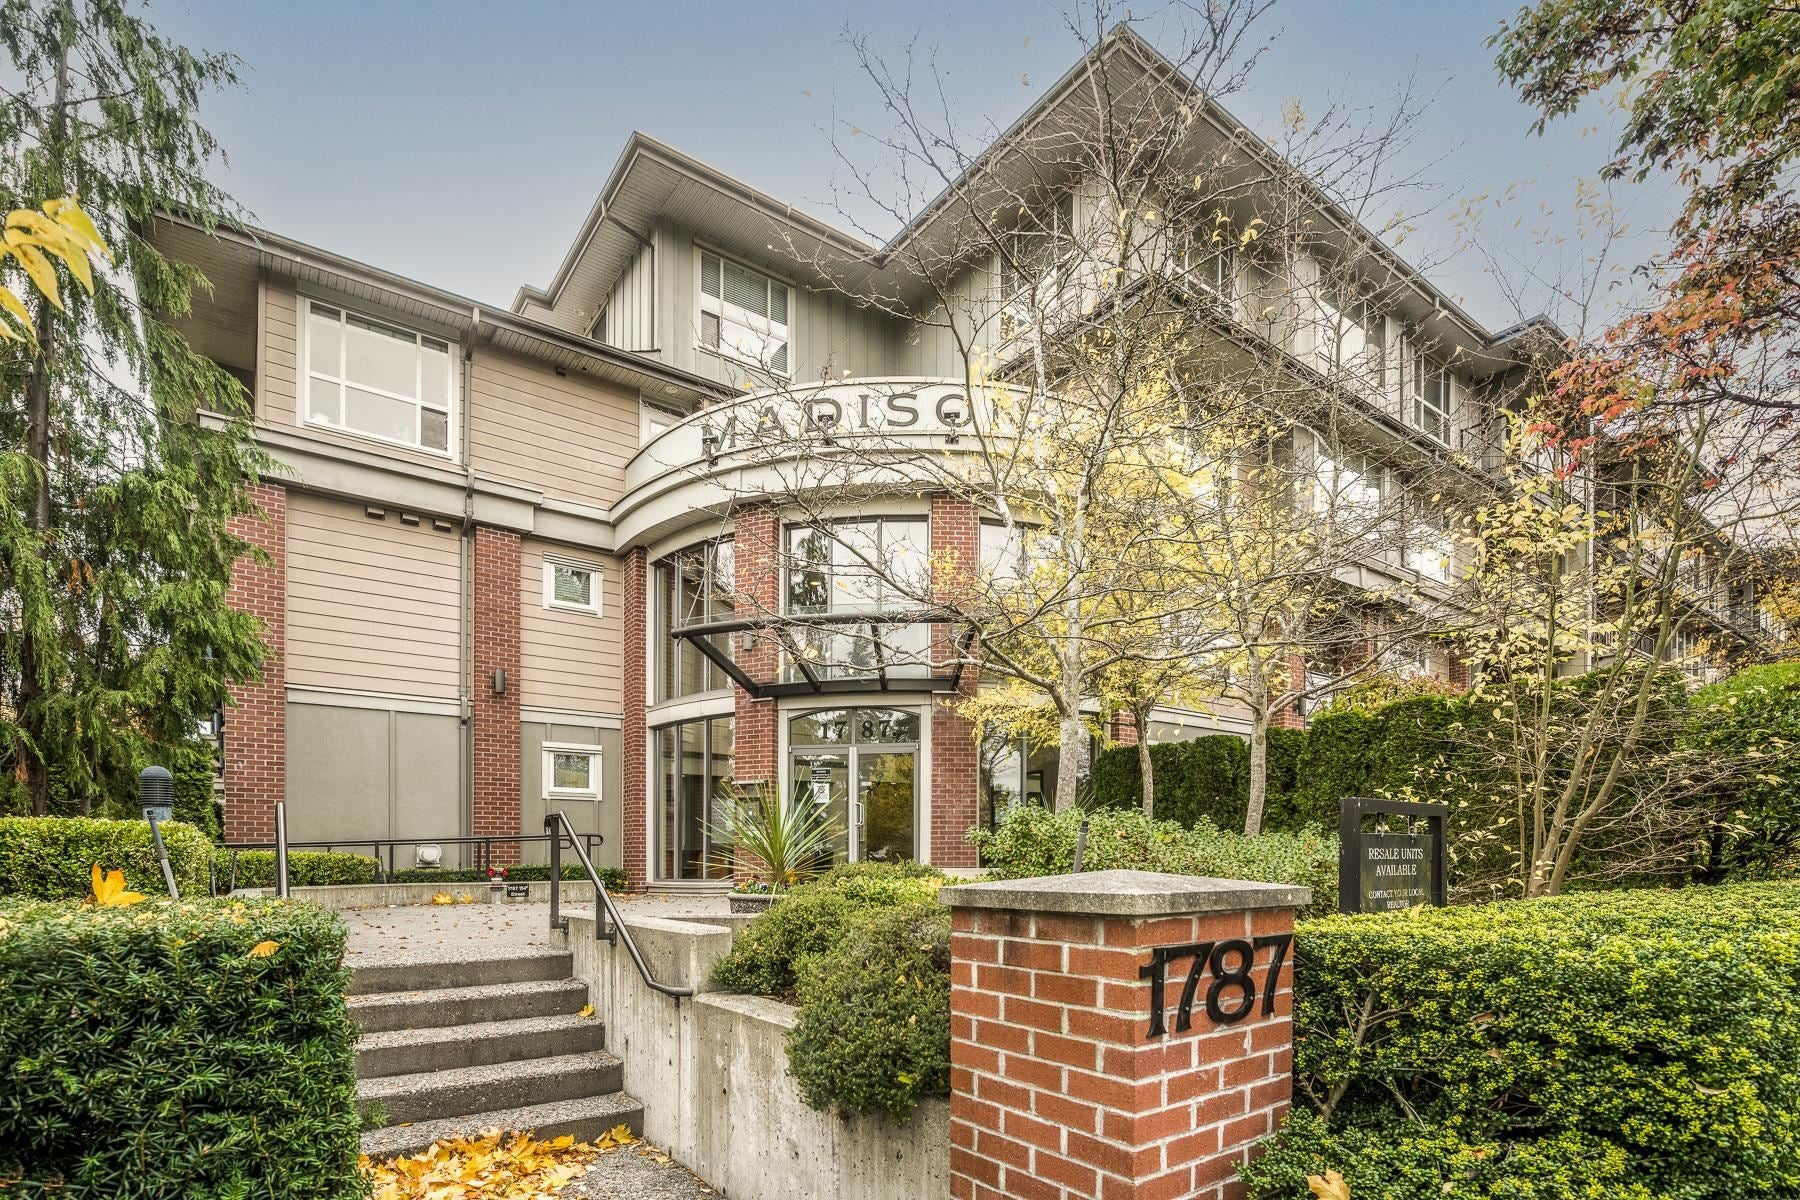 206 1787 154 STREET - King George Corridor Apartment/Condo for sale, 2 Bedrooms (R2628602)